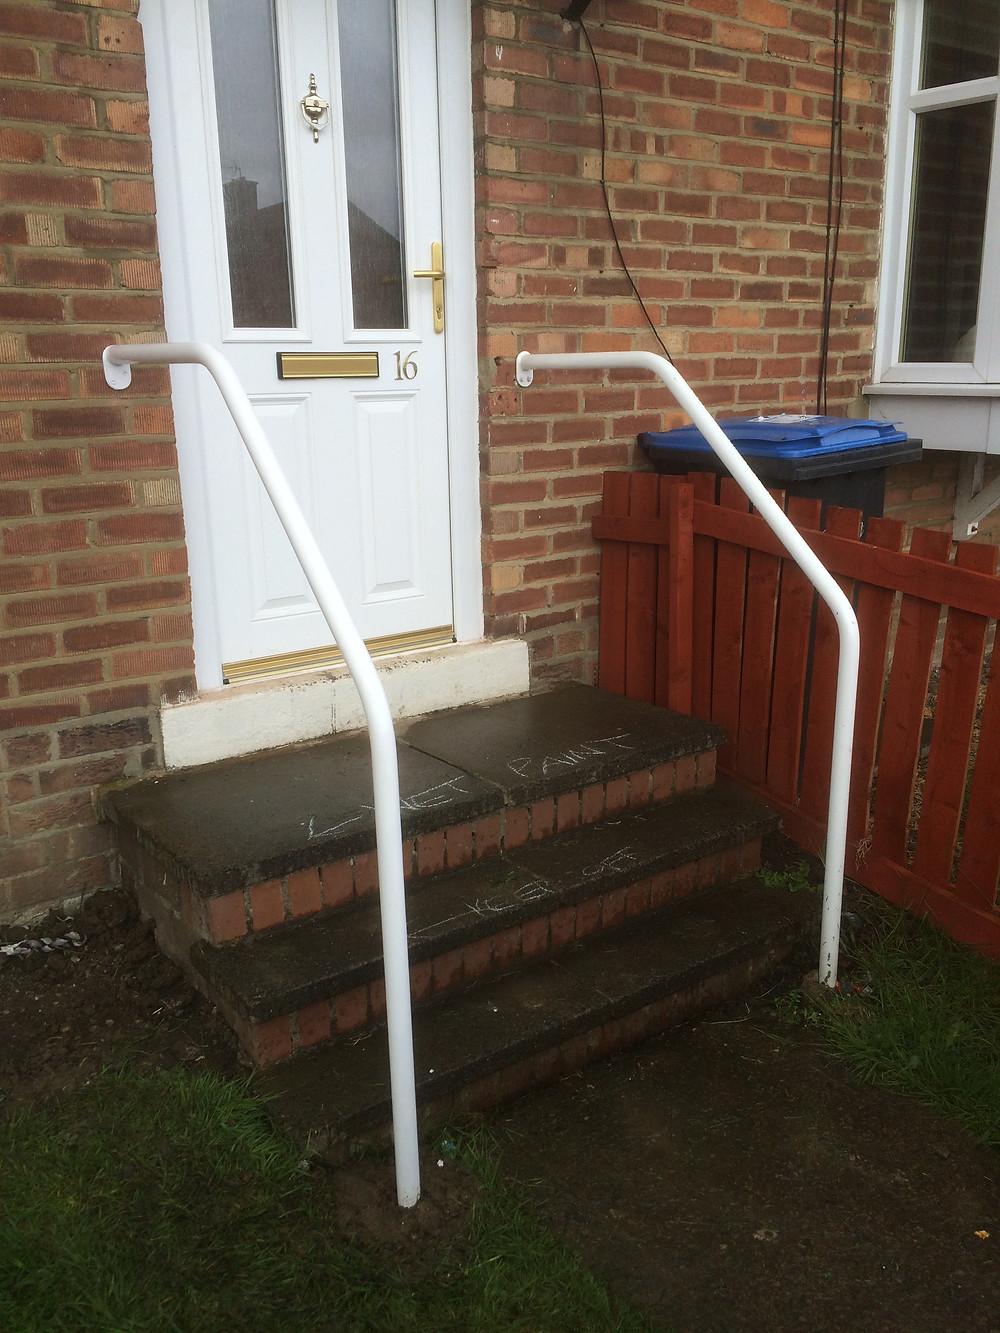 Wall to floor handrails